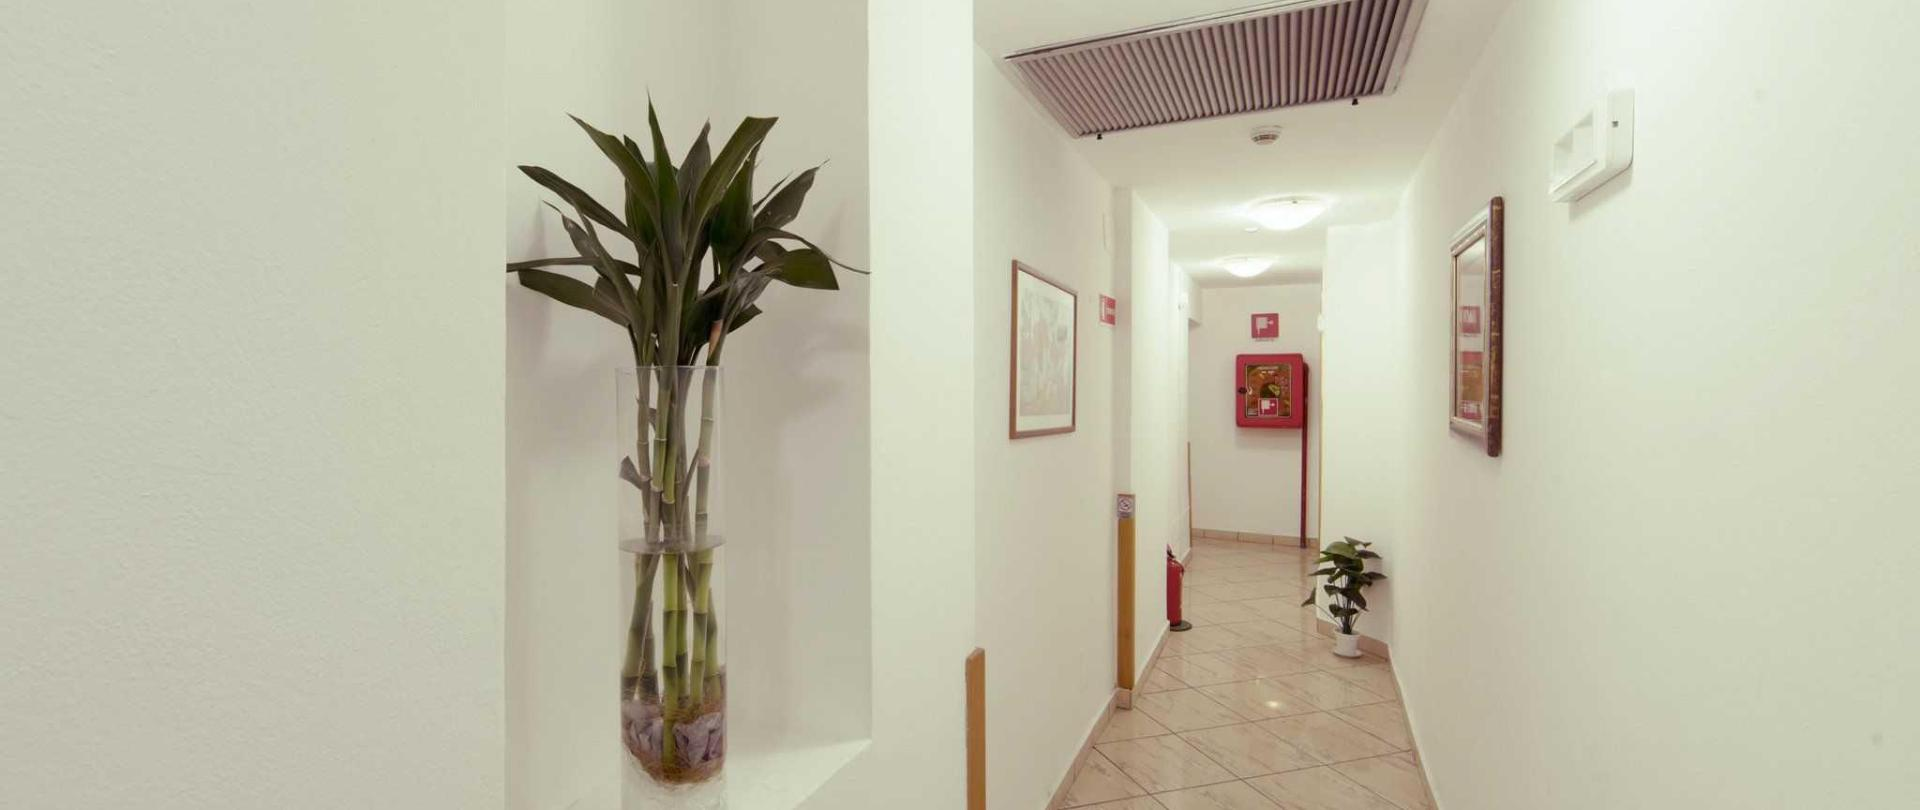 room-000-1.jpg